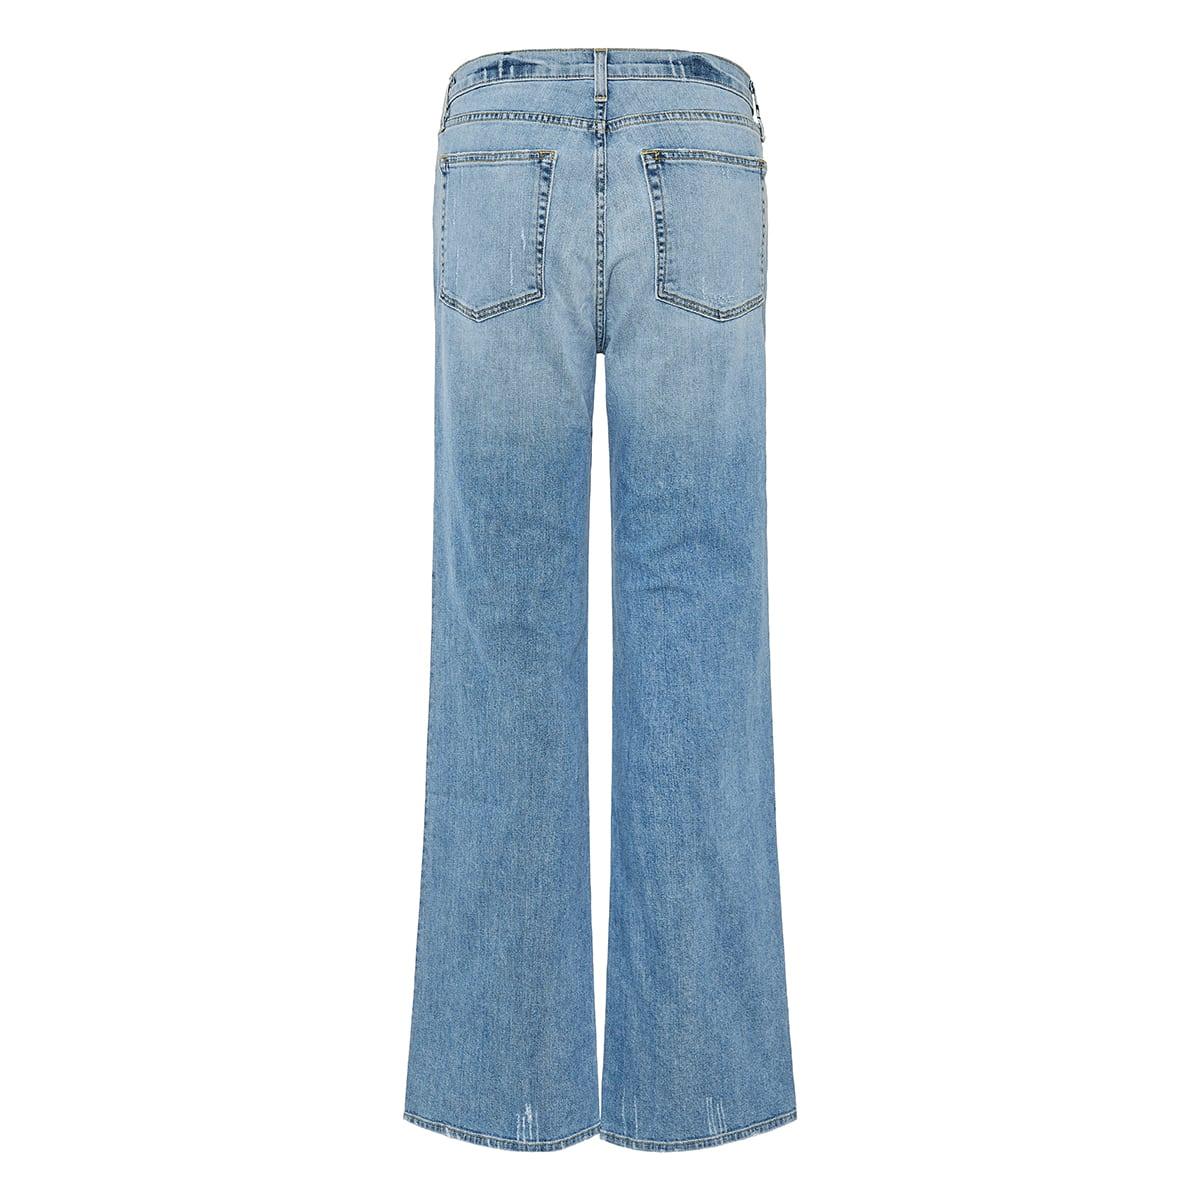 Celia flared jeans